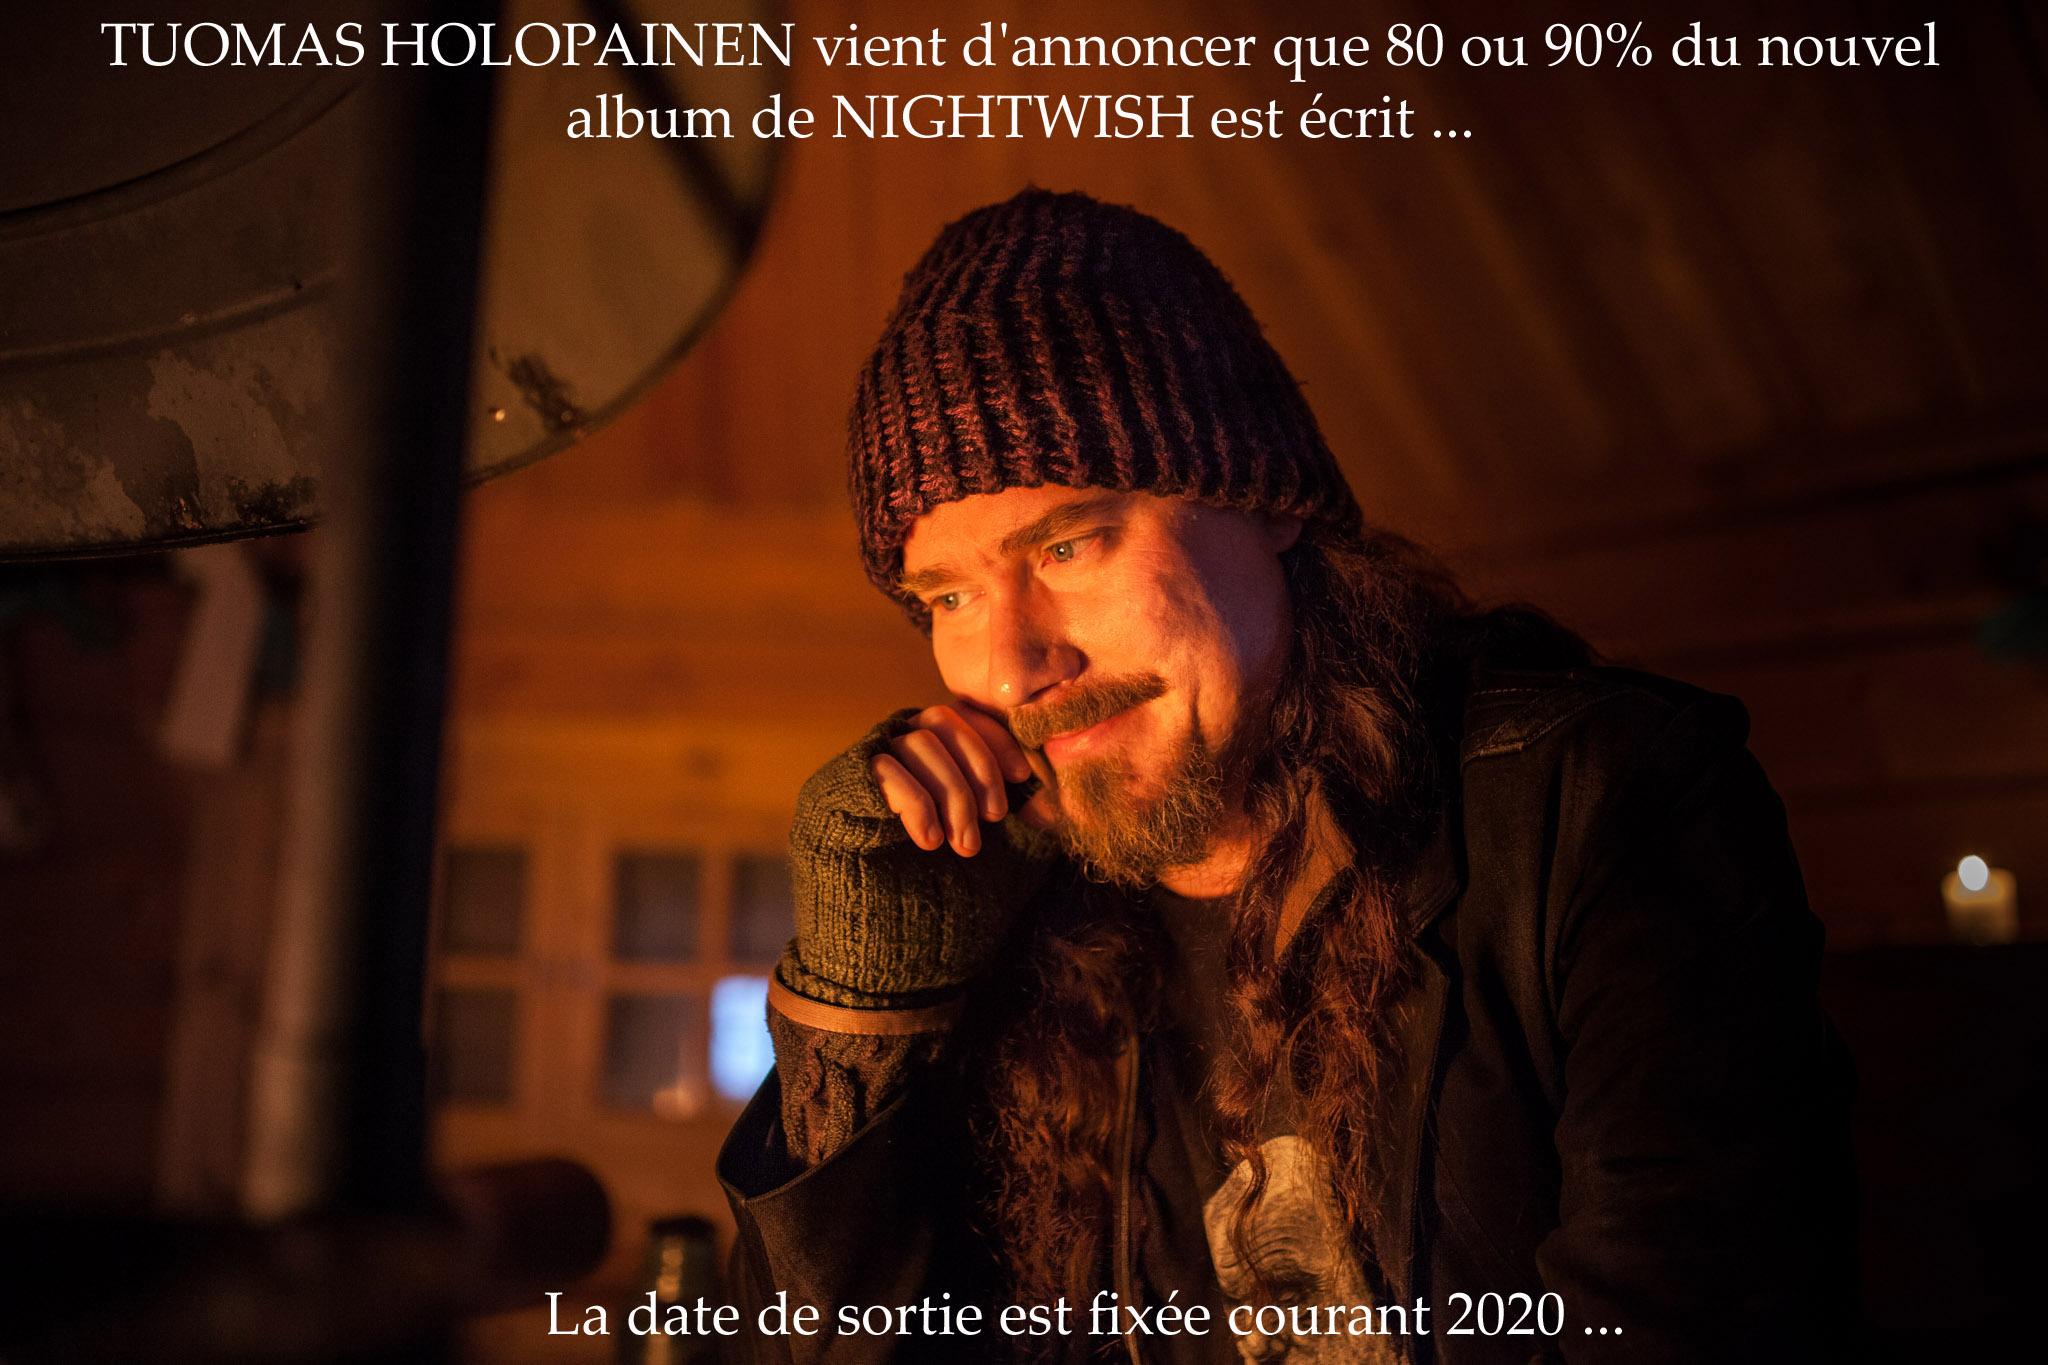 TUOMAS HOLOPAINEN (Nightwish) parle du nouvel album ... Holopa10